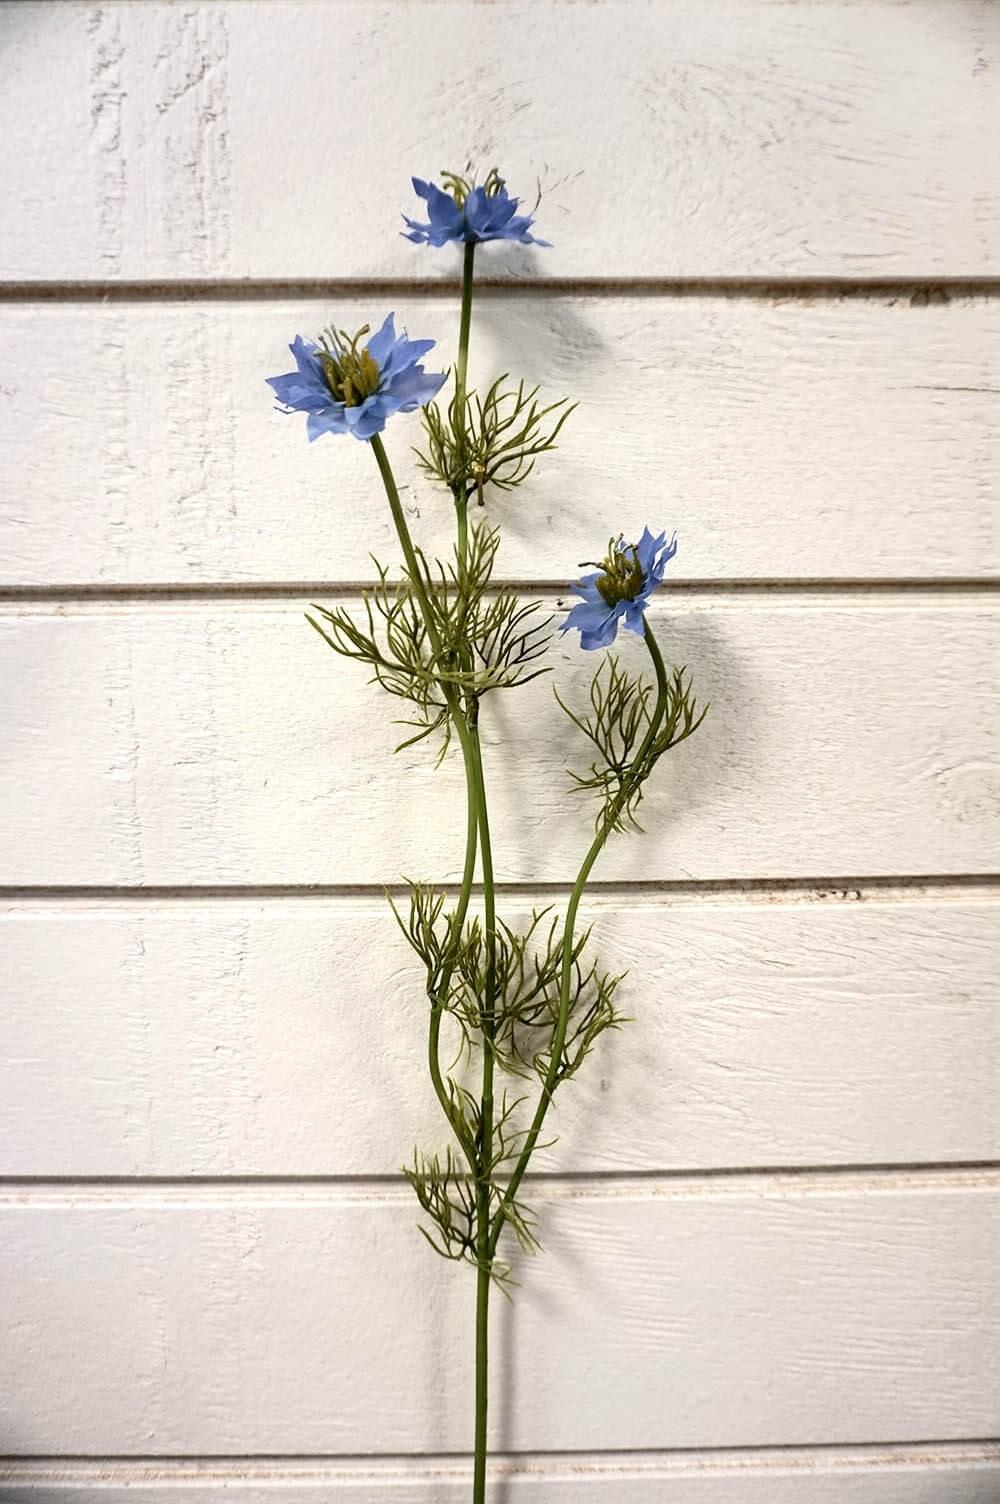 Nigella, konstgjord blomma